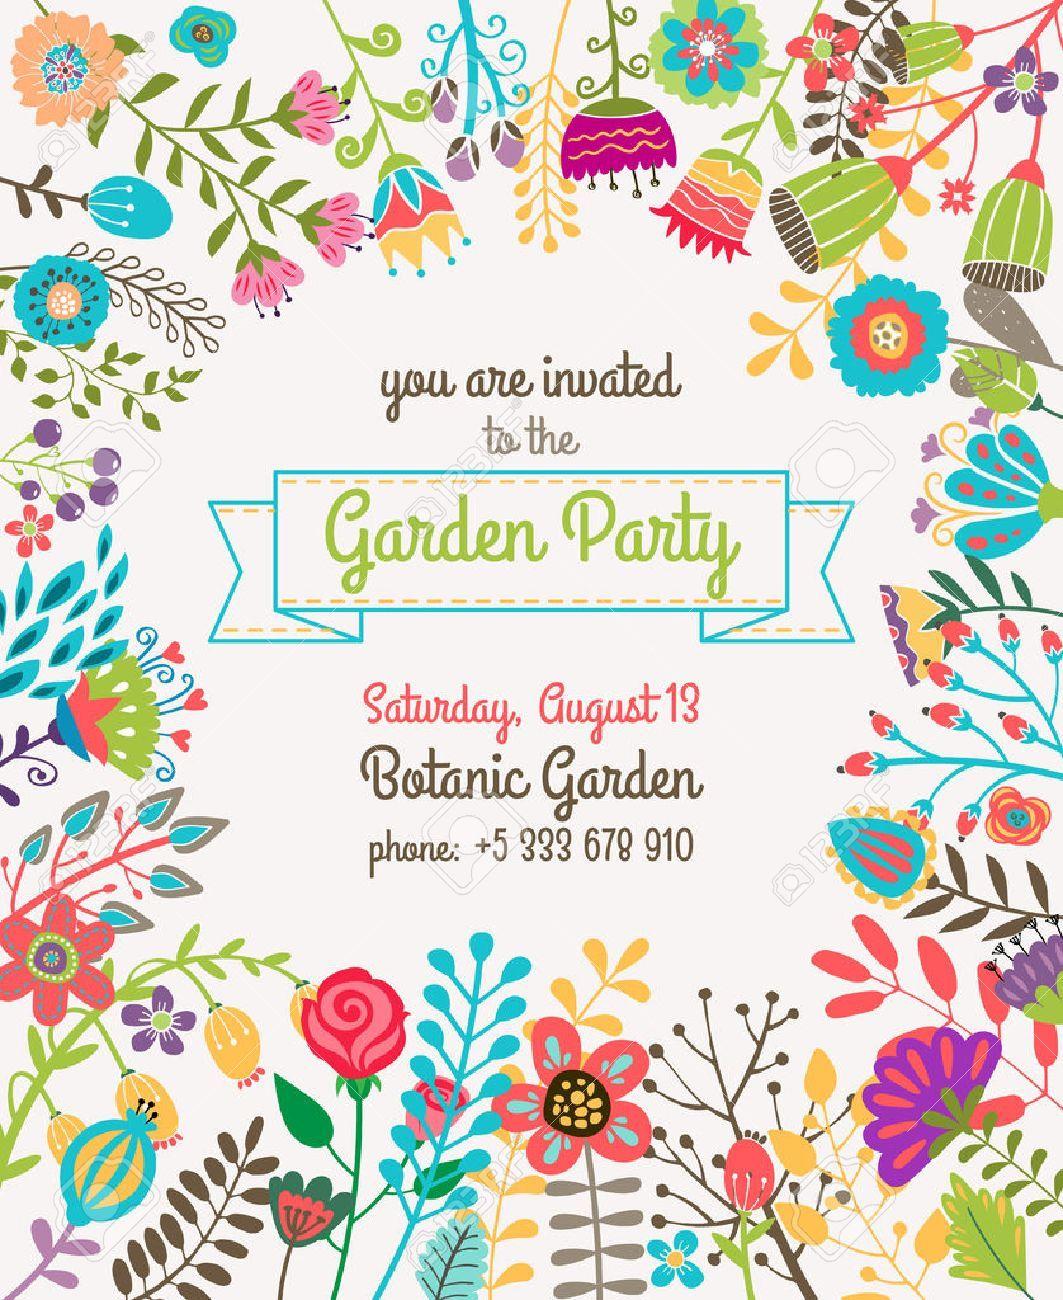 Free Printable Garden Tea Party Invitation Templates Tea Party Invitations Garden Party Invitations Party Invite Template